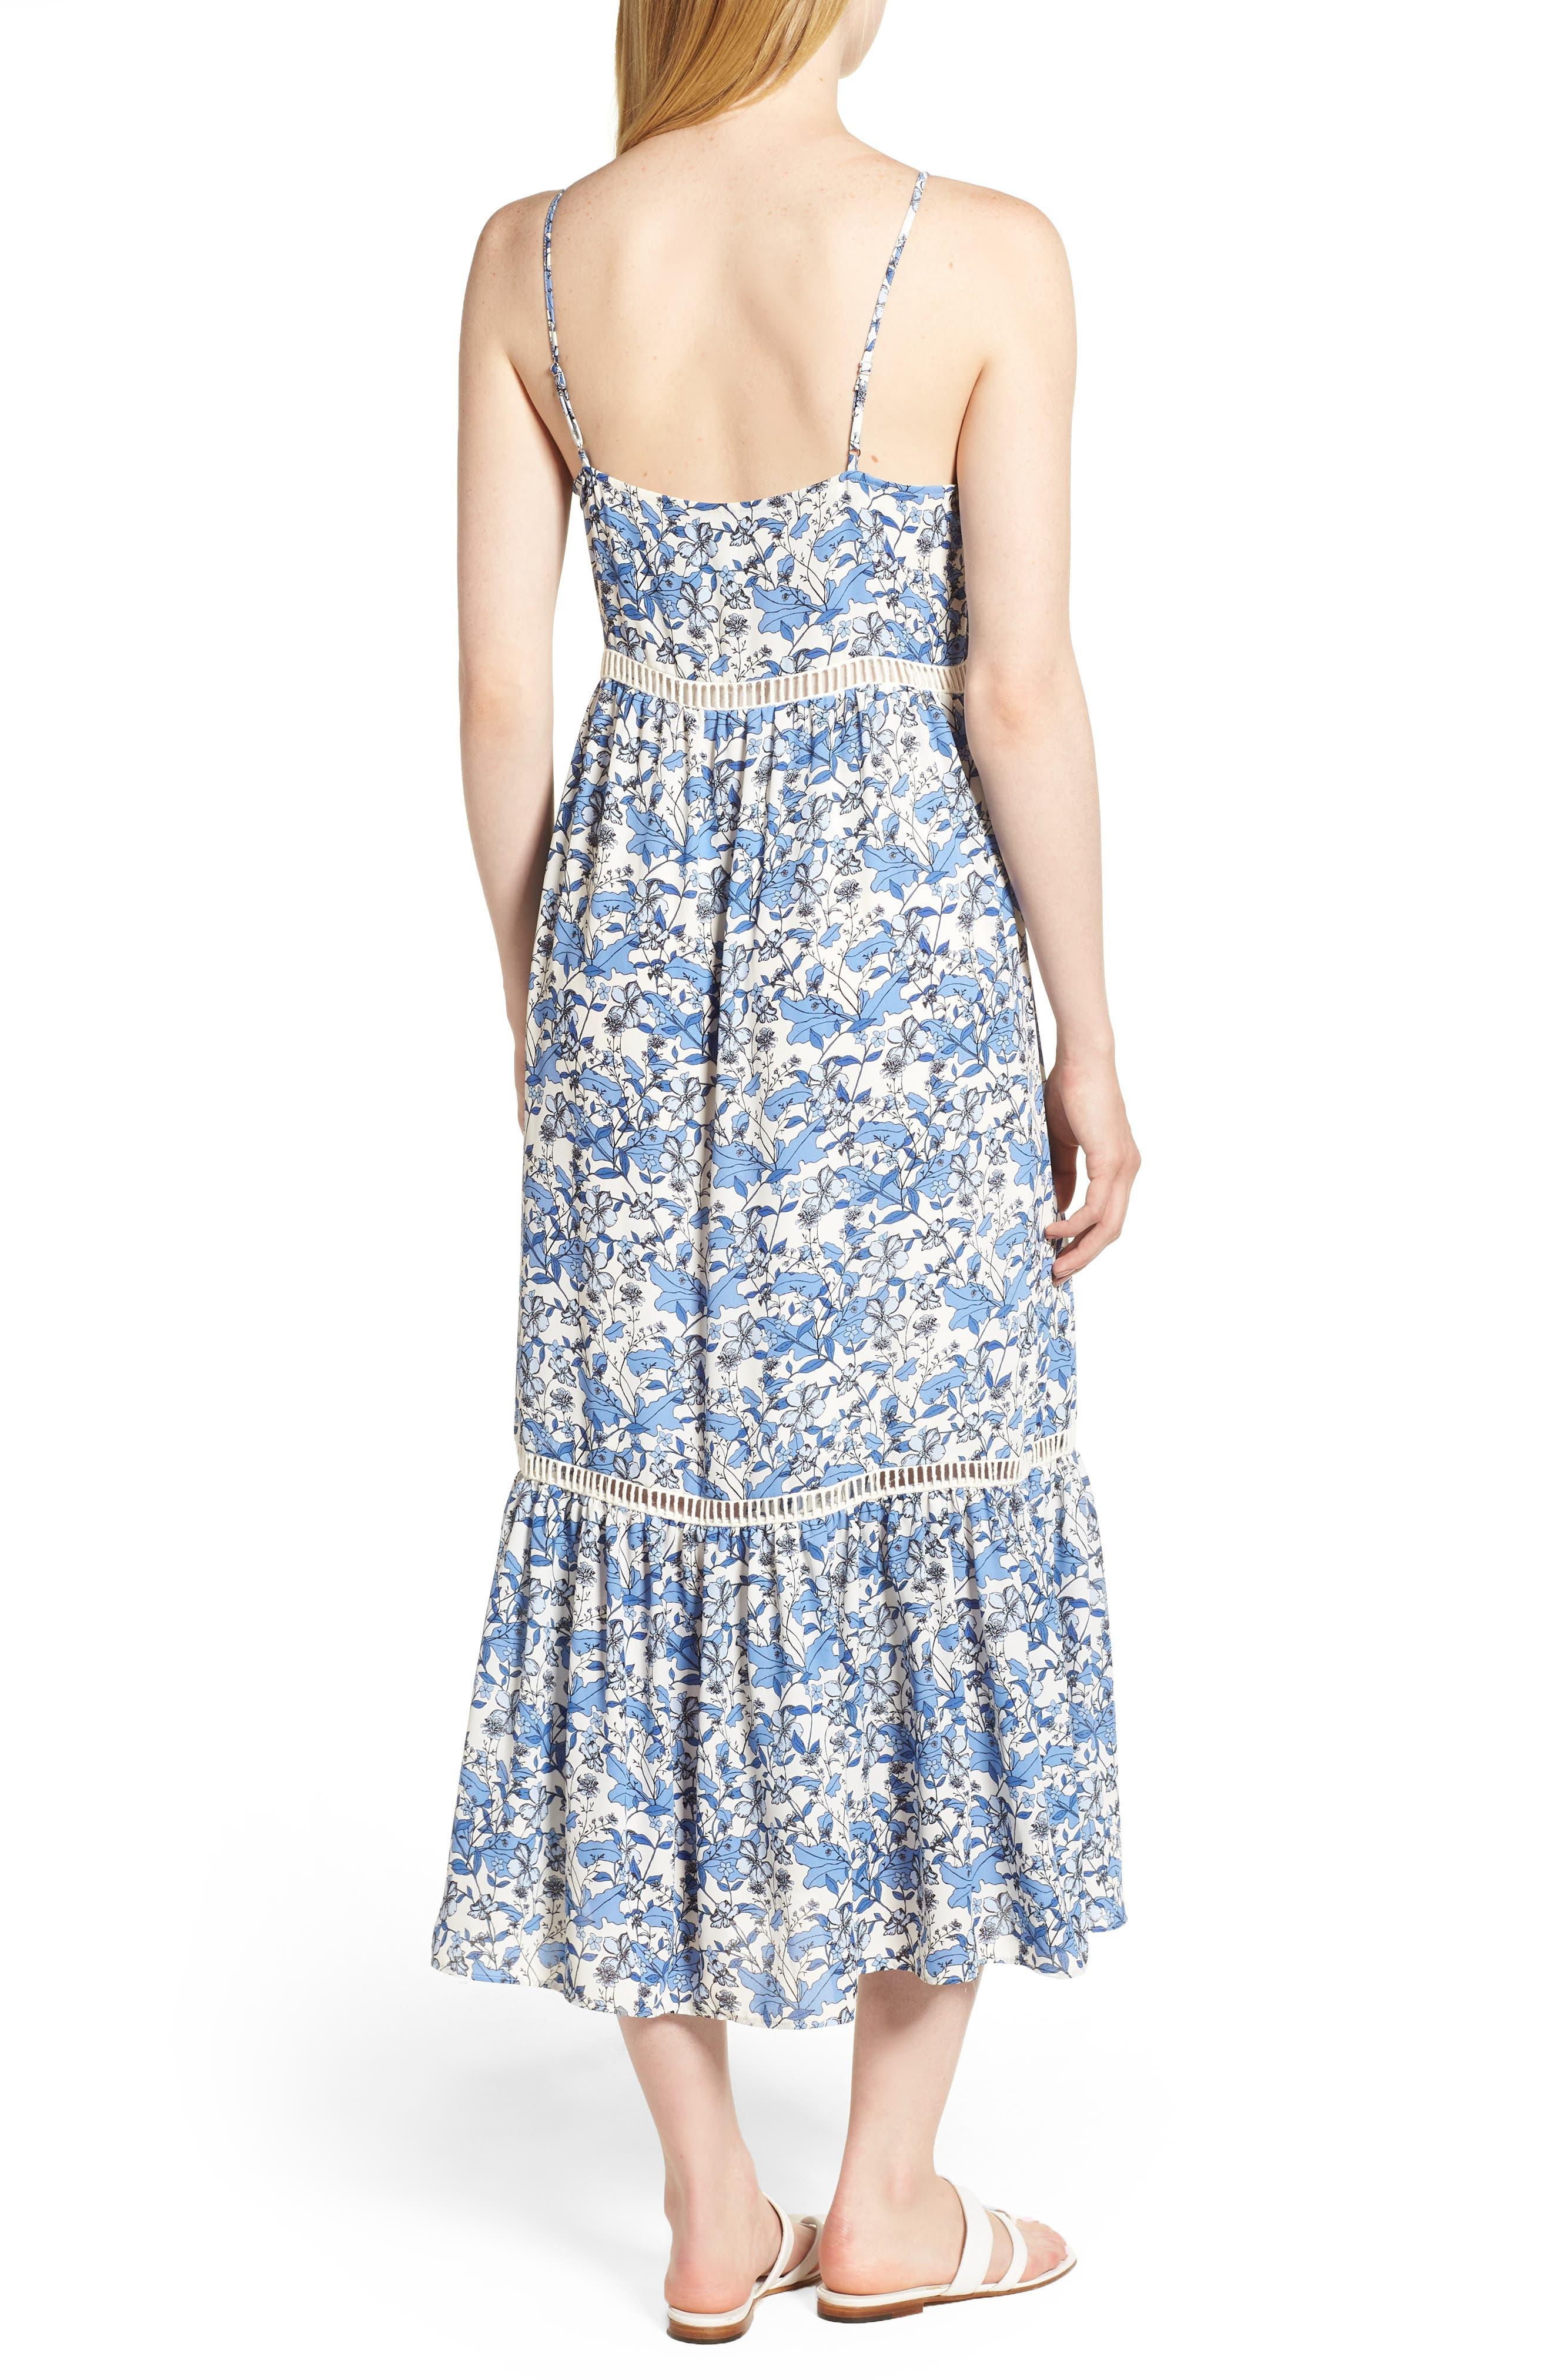 Ivy Forest Maxi Dress,                             Alternate thumbnail 2, color,                             Antique White